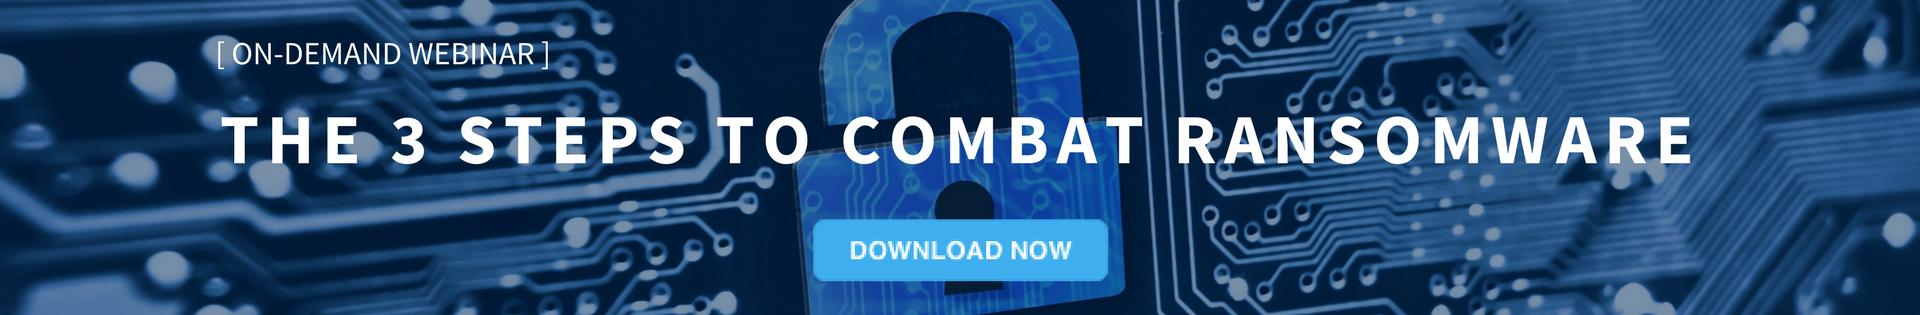 Ransomware-webinar-download